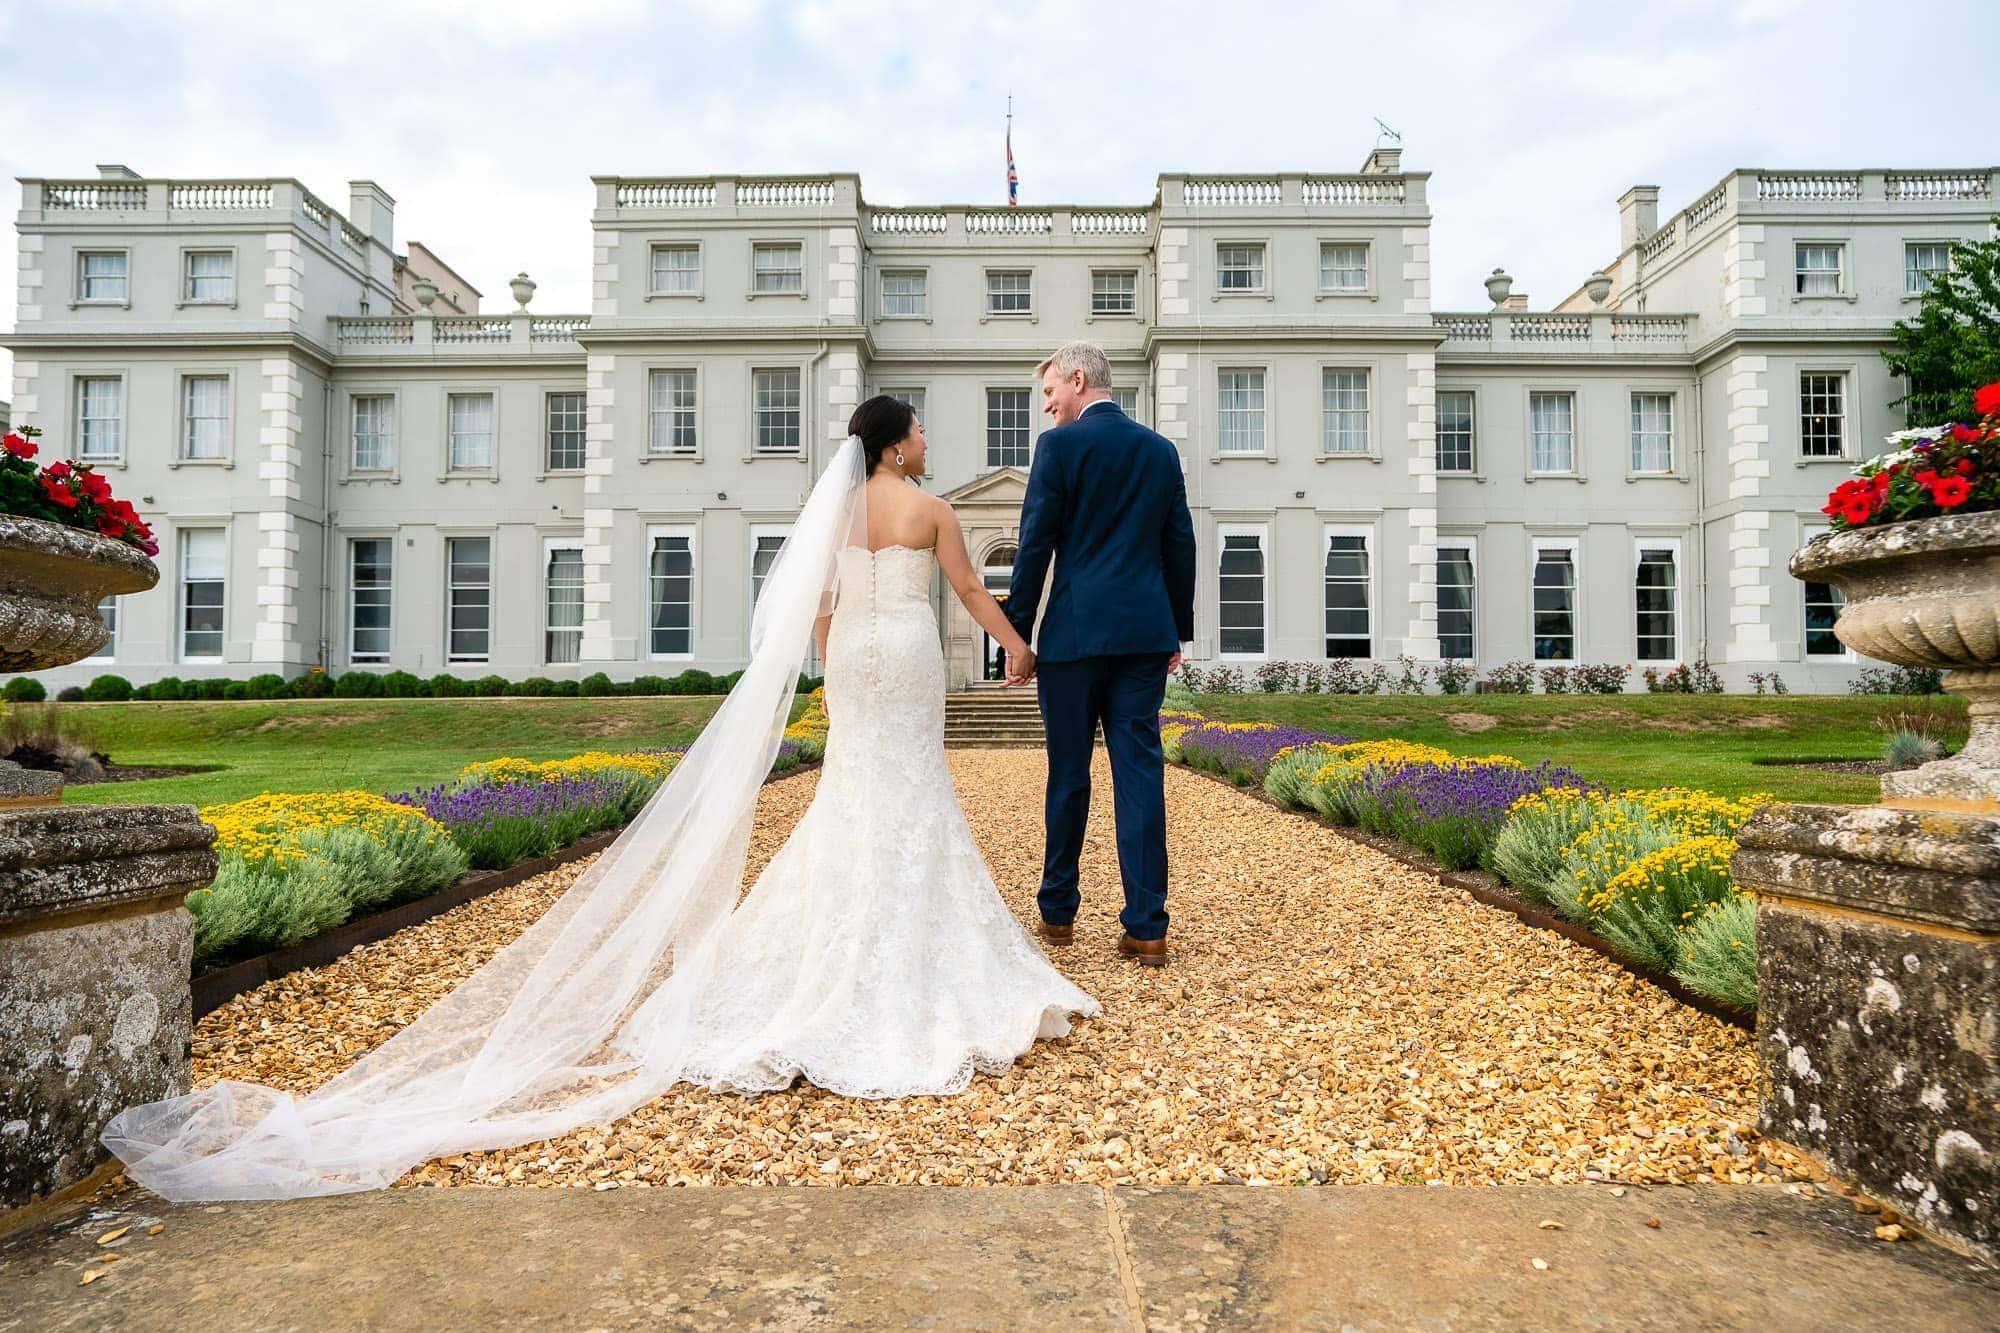 De Vere Wokefiled Estate wedding photographer